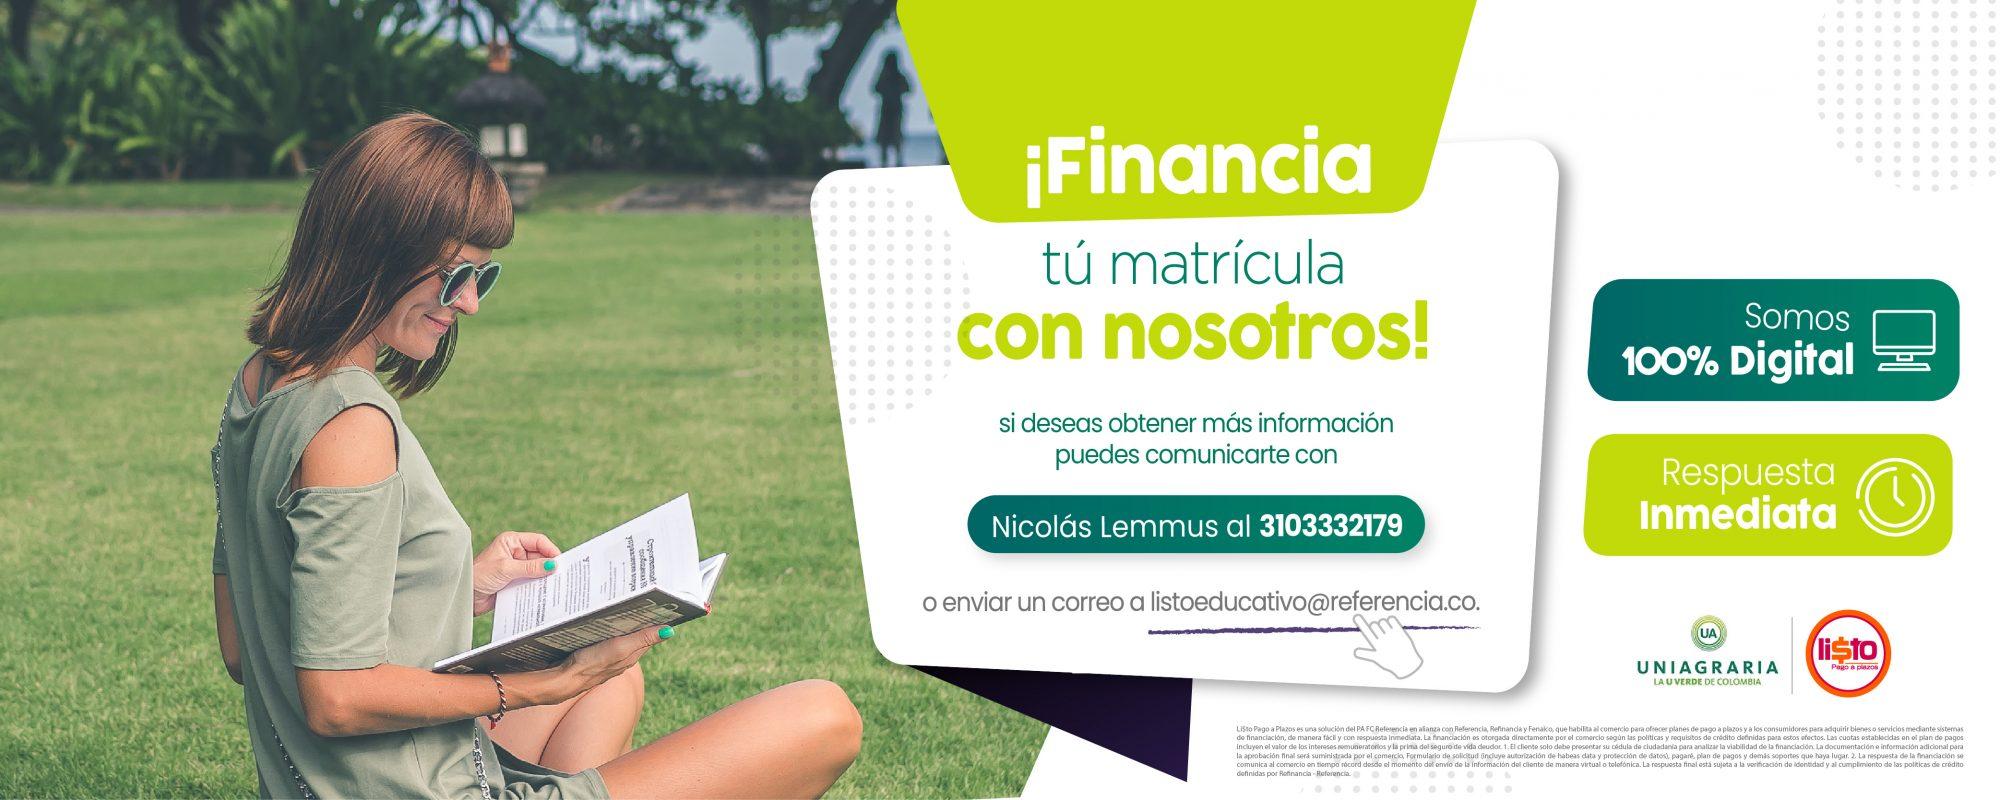 Refinancia